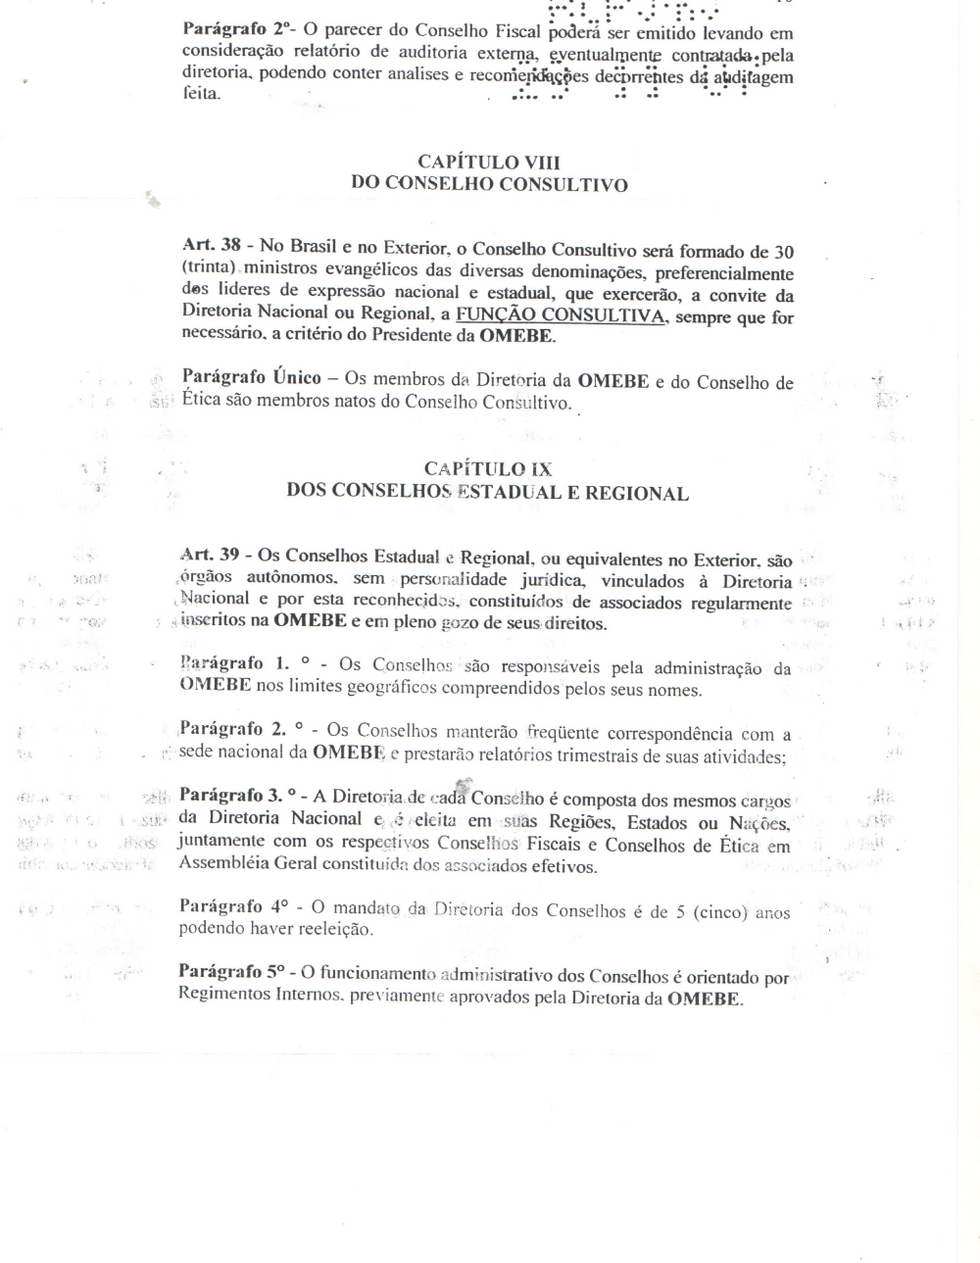 Estatuto-pag-10.png